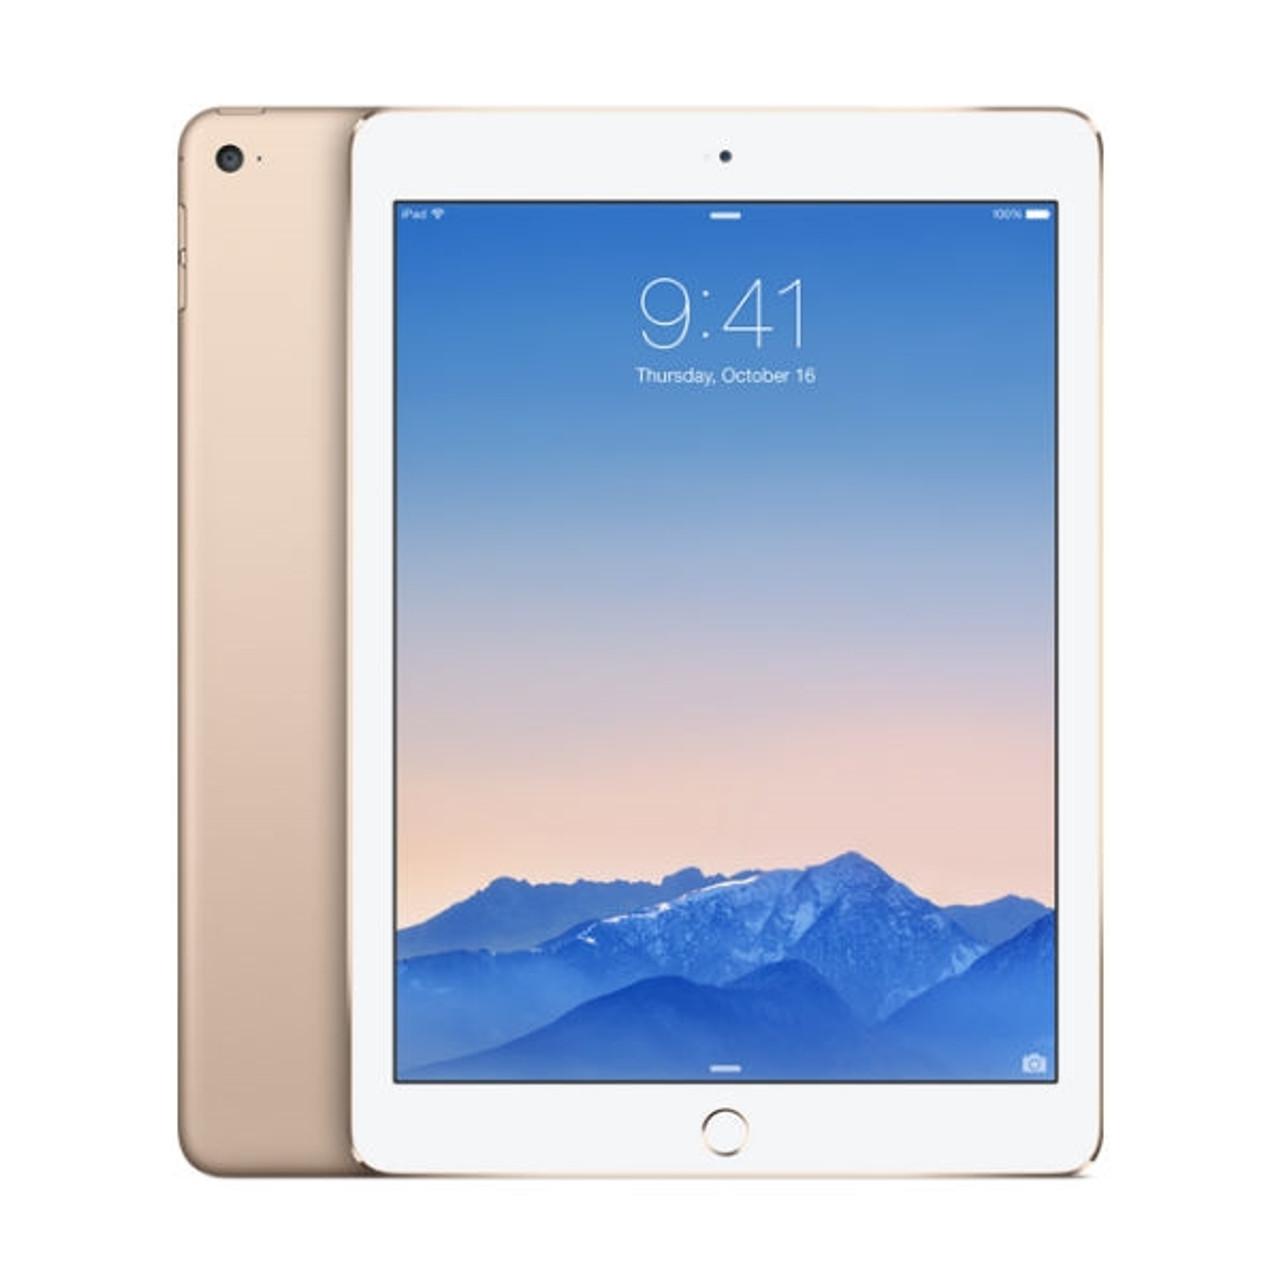 Cellular Apple iPad air 2-64GB Gold Fully Unlocked